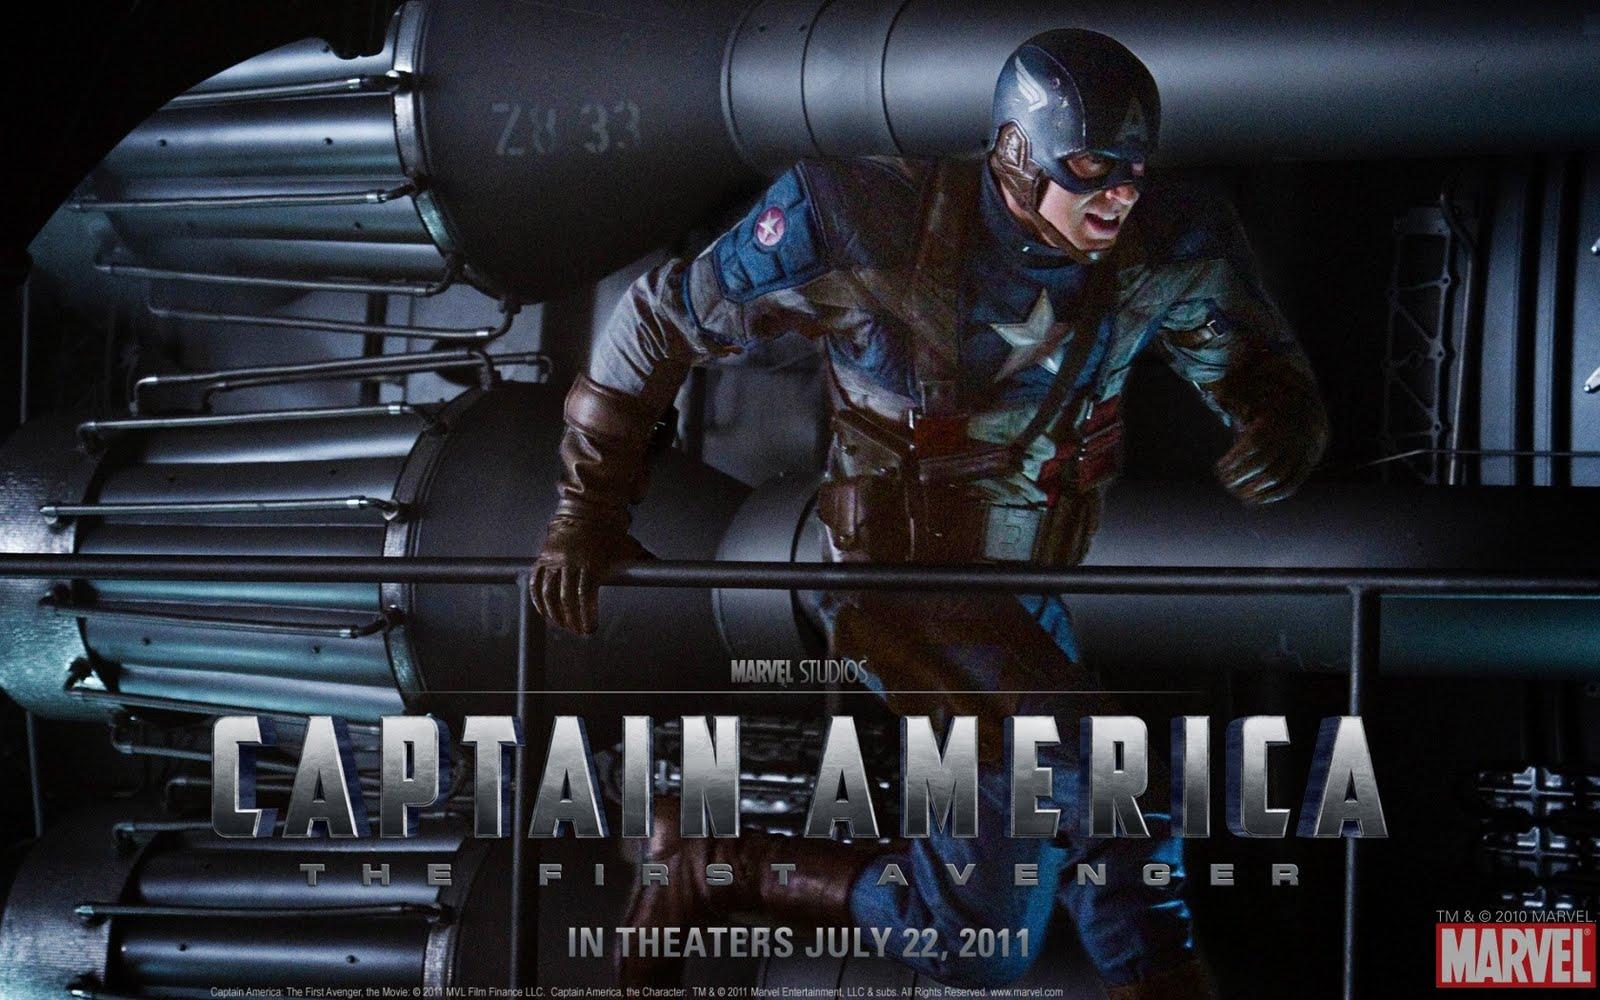 http://4.bp.blogspot.com/-6m0pWa9iP1U/TjQ4NKbNPsI/AAAAAAAAB4s/oDVkE3c7ZoI/s1600/Chris_Evans_in_Captain_America%2B_The_First_Avenger_Wallpaper_3_1024.jpg